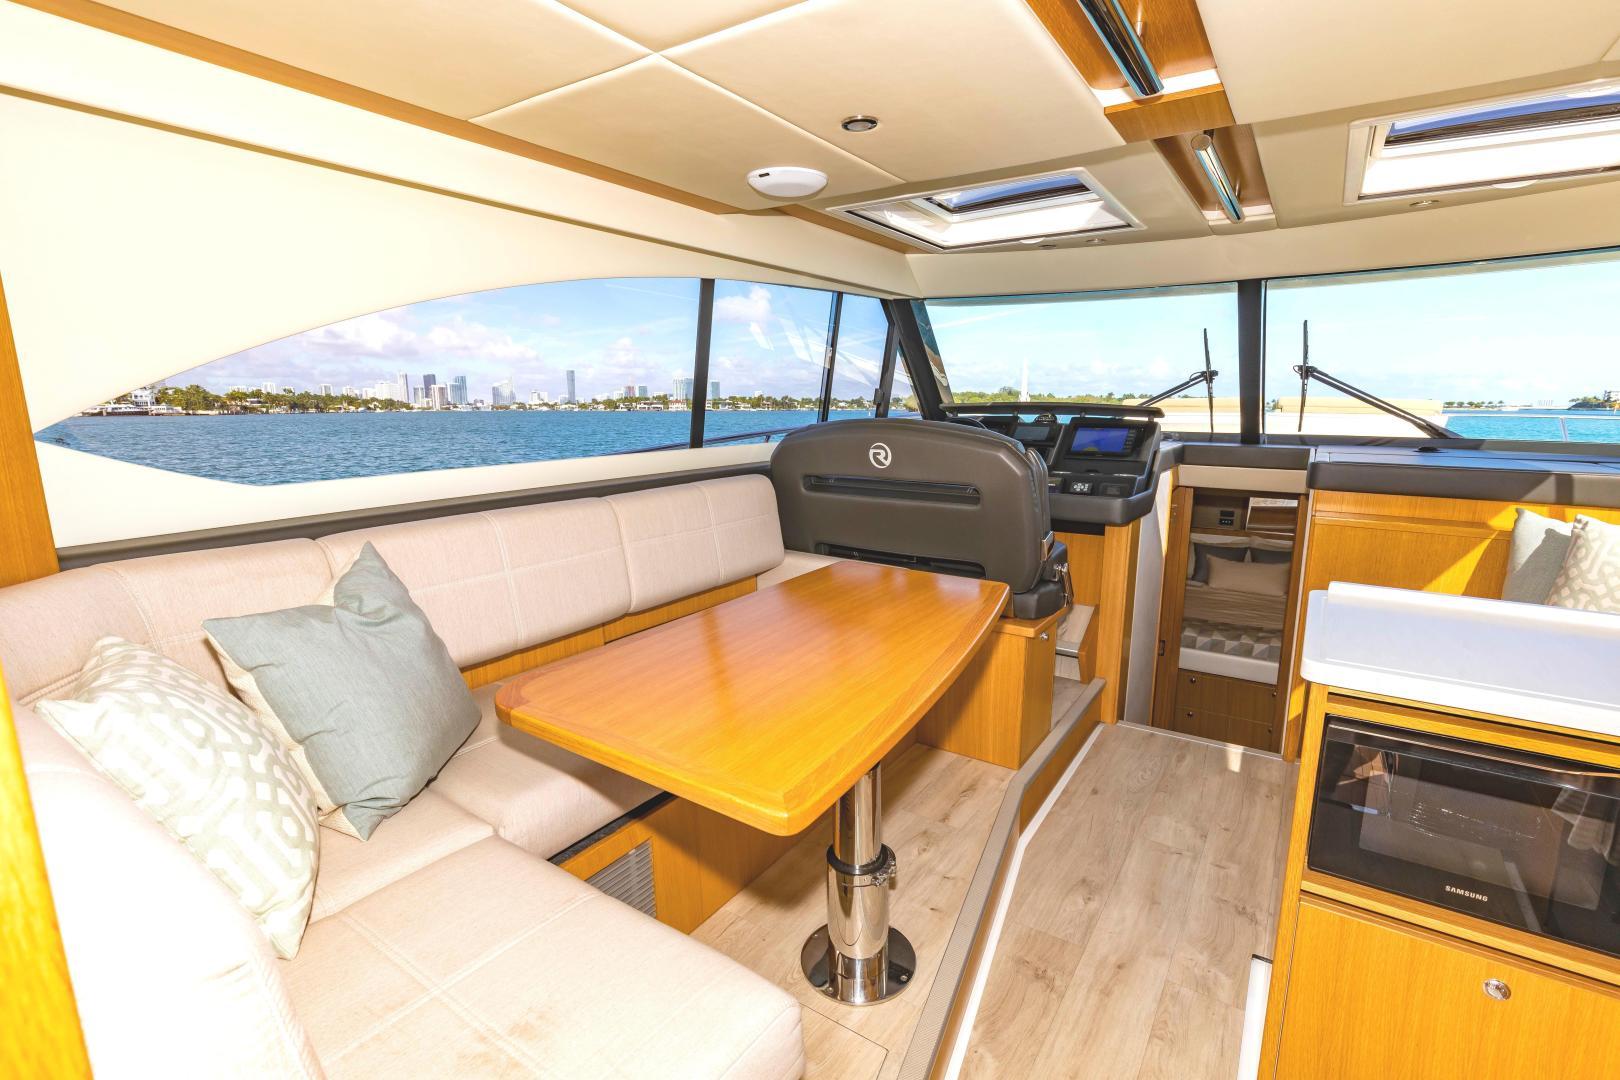 Riviera-395 SUV 2019-Ipanema Miami Beach-Florida-United States-1614897   Thumbnail